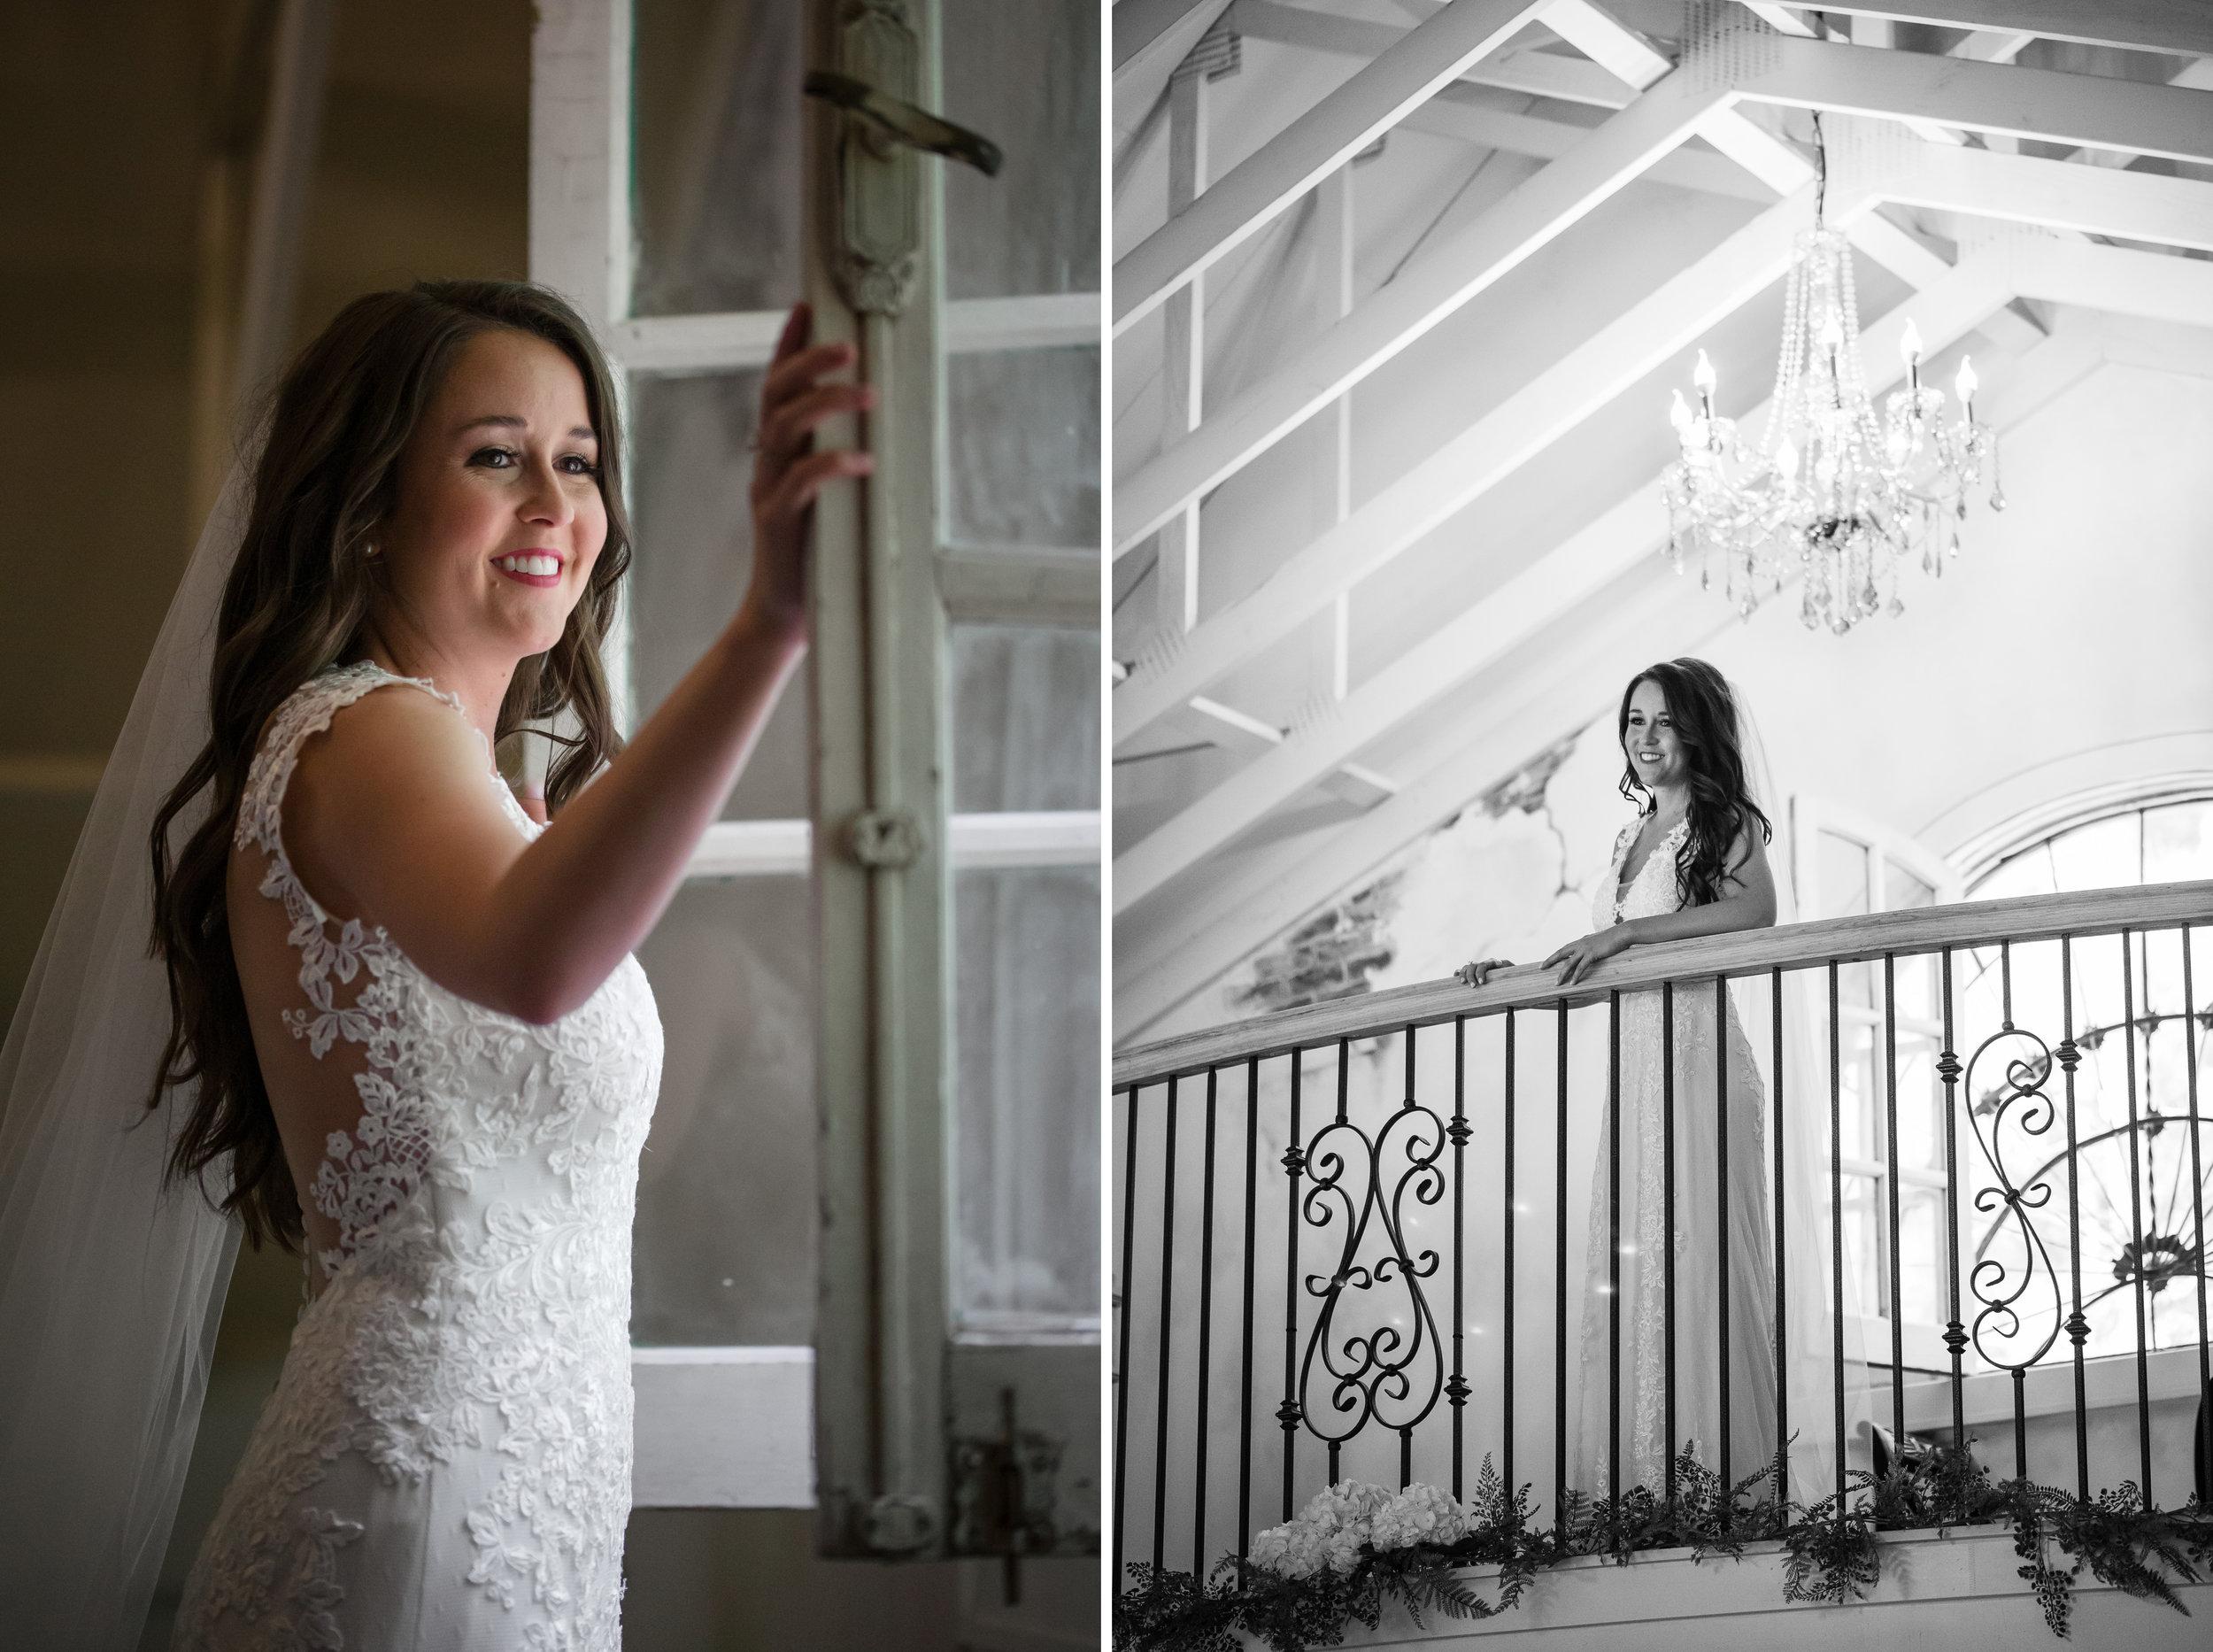 Bella-Sera-Gardens-Alabama-Mobile-Photography-Pensacola-Navarre-Fairhope.jpgBella-Sera-Gardens-Alabama-Mobile-Photography-Pensacola-Navarre-Fairhope-Wedding.jpg